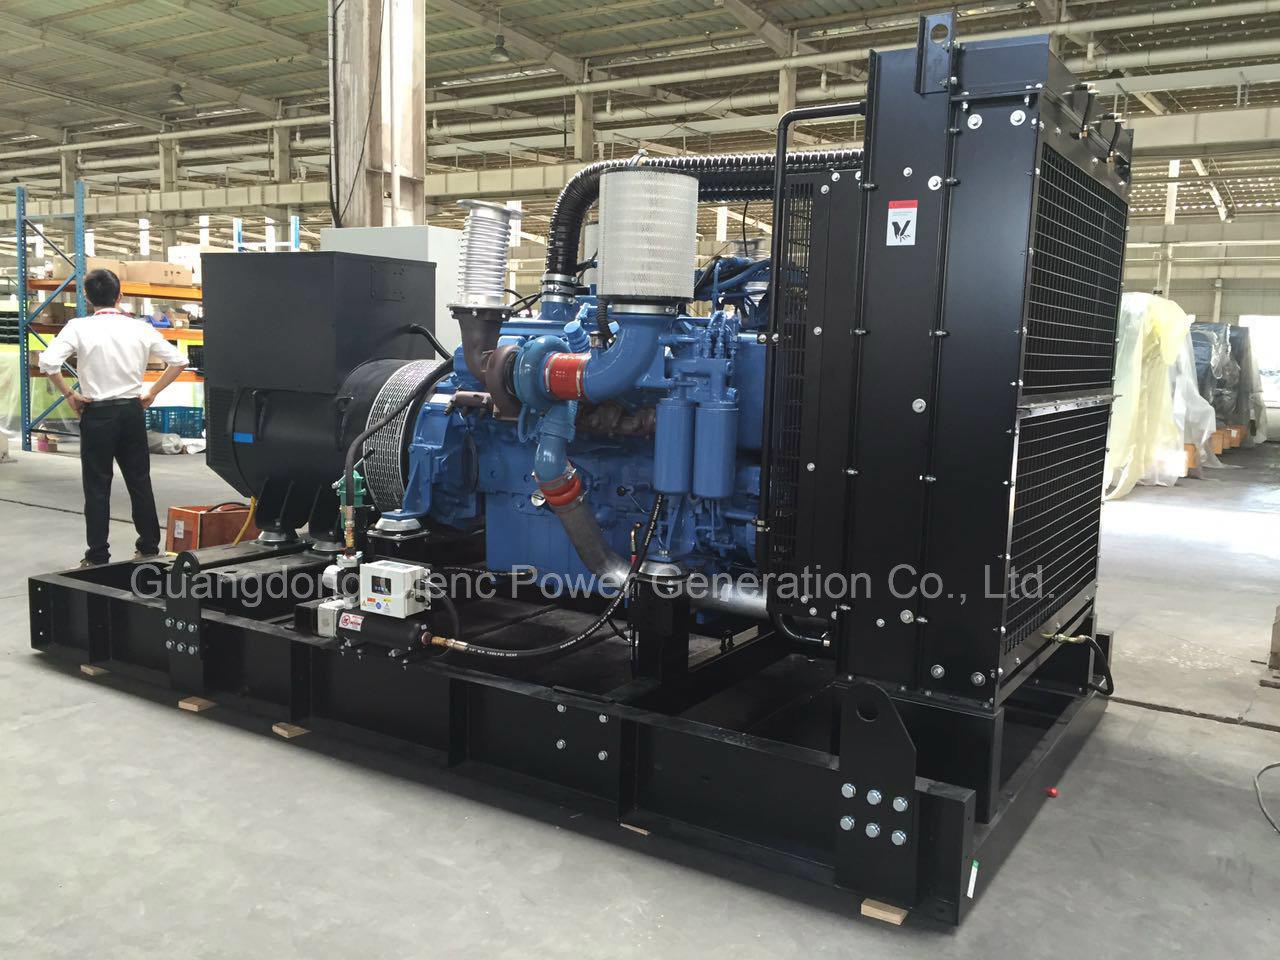 250kw Diesel Gene Set With Mtu Engine Stamford Alternator Delixi Air Circuit Breaker Cdw16300 China Manufacturer Guangdong Olenc Power